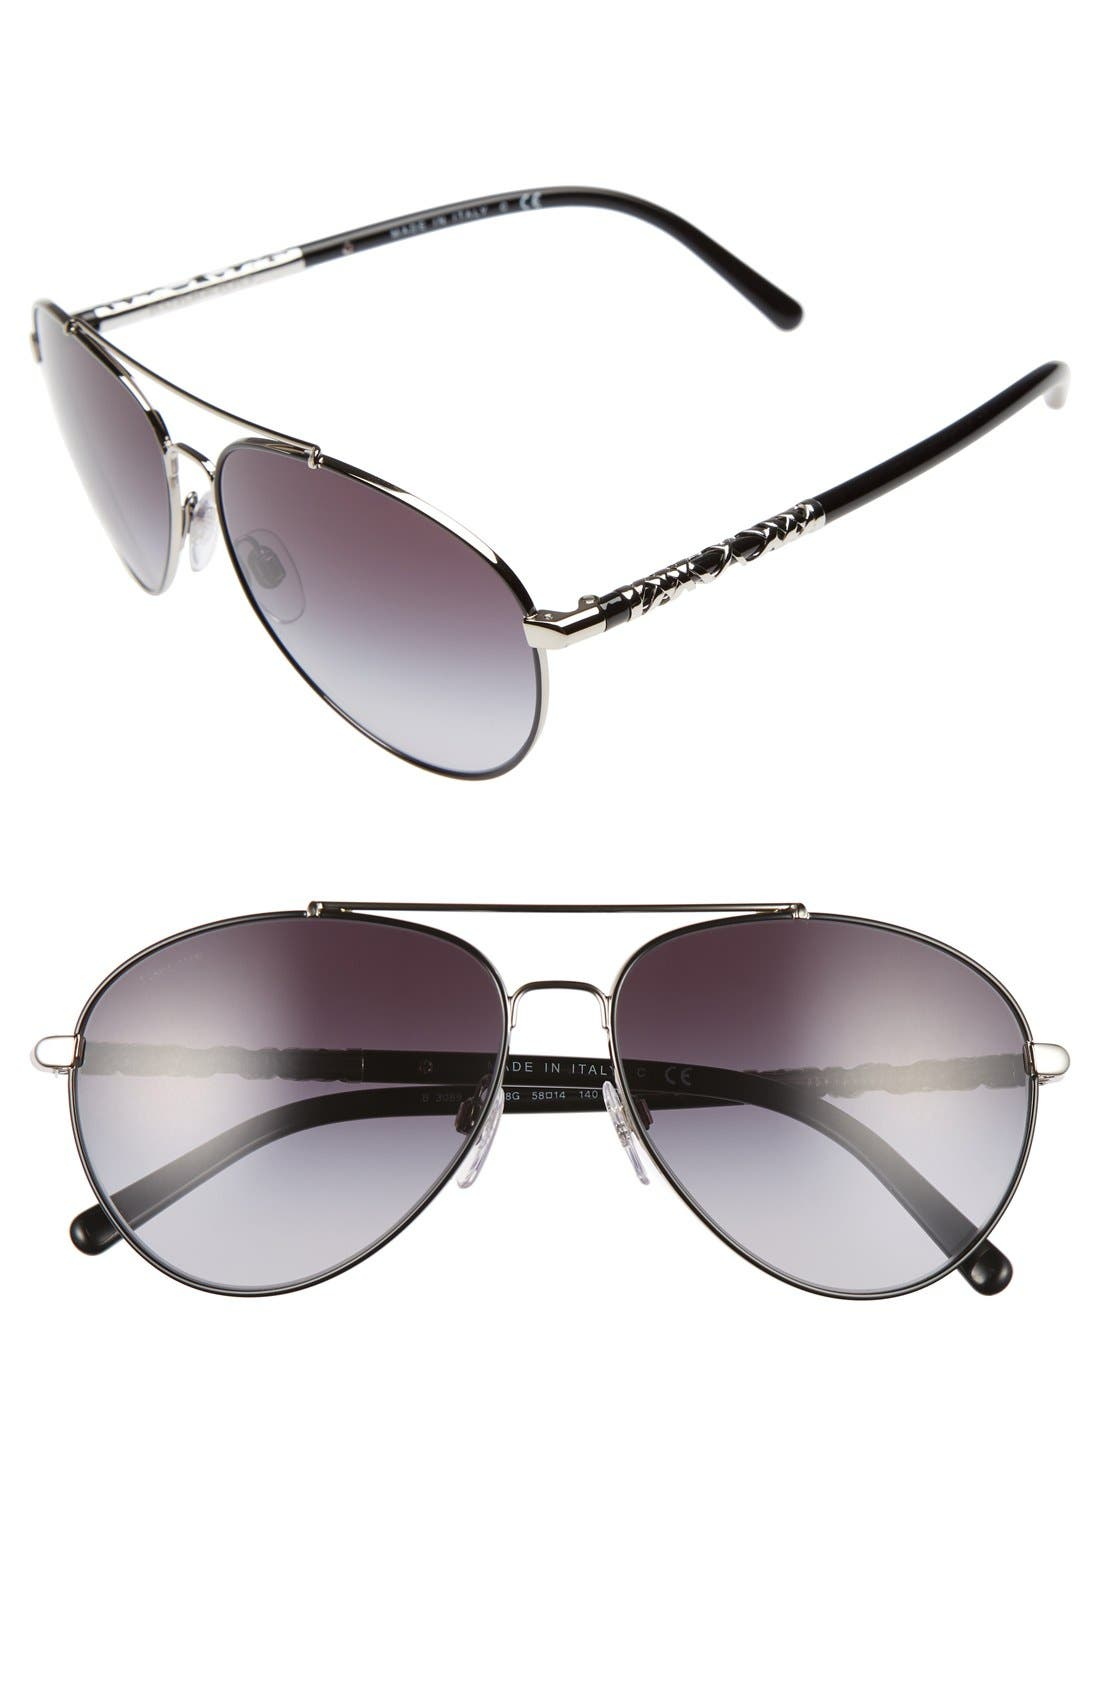 58mm Aviator Sunglasses,                         Main,                         color, 020